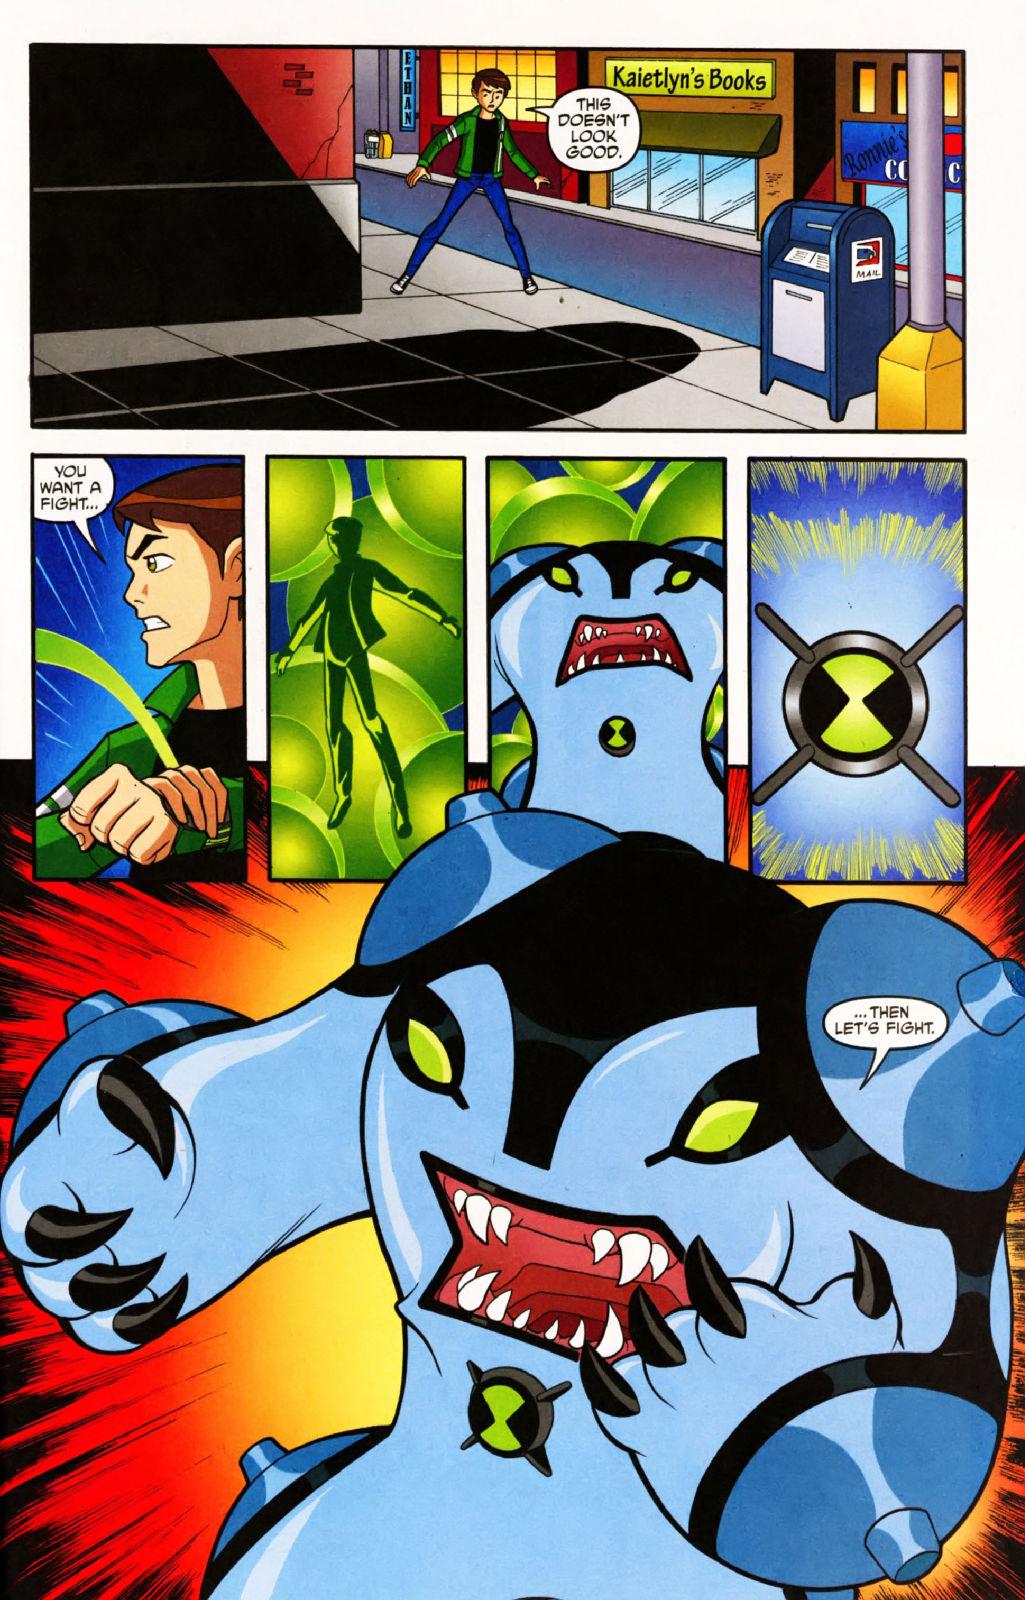 Ben10终极异形漫画 有爱了